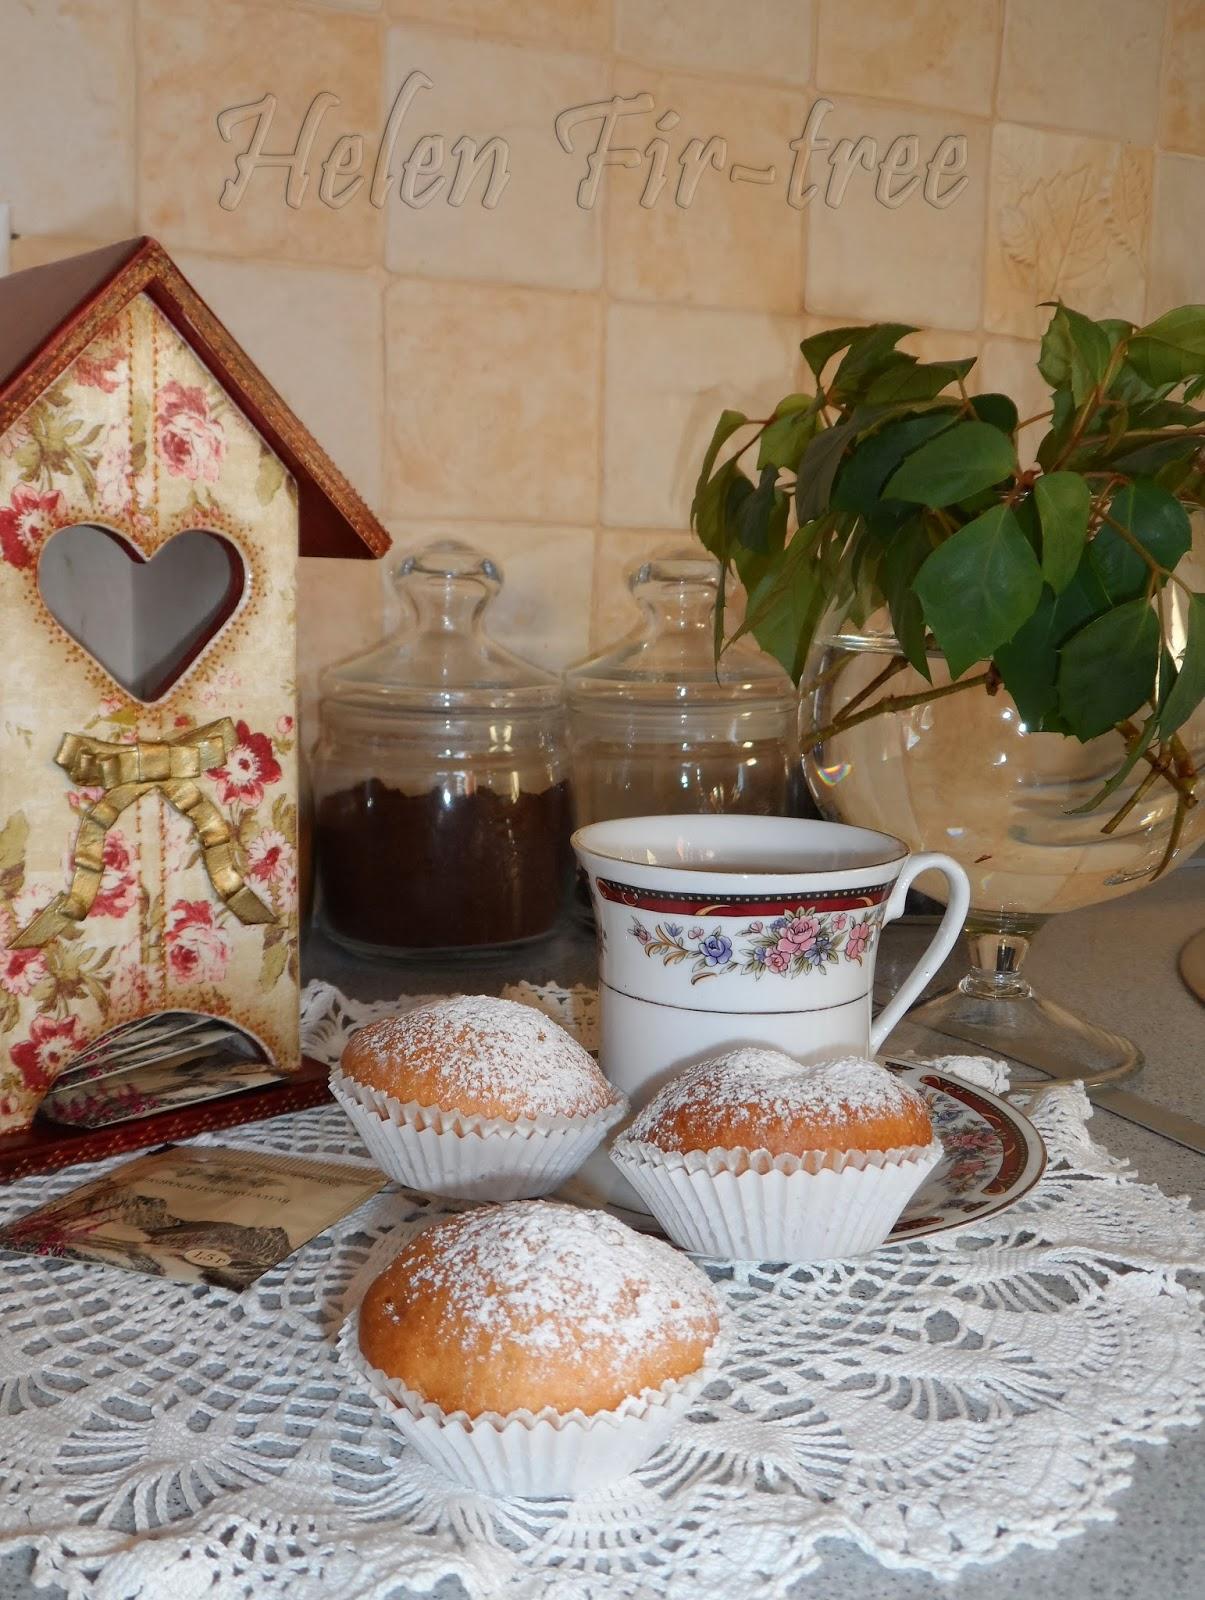 Helen Fir-tree декупаж чайный домик decoupage teahouse